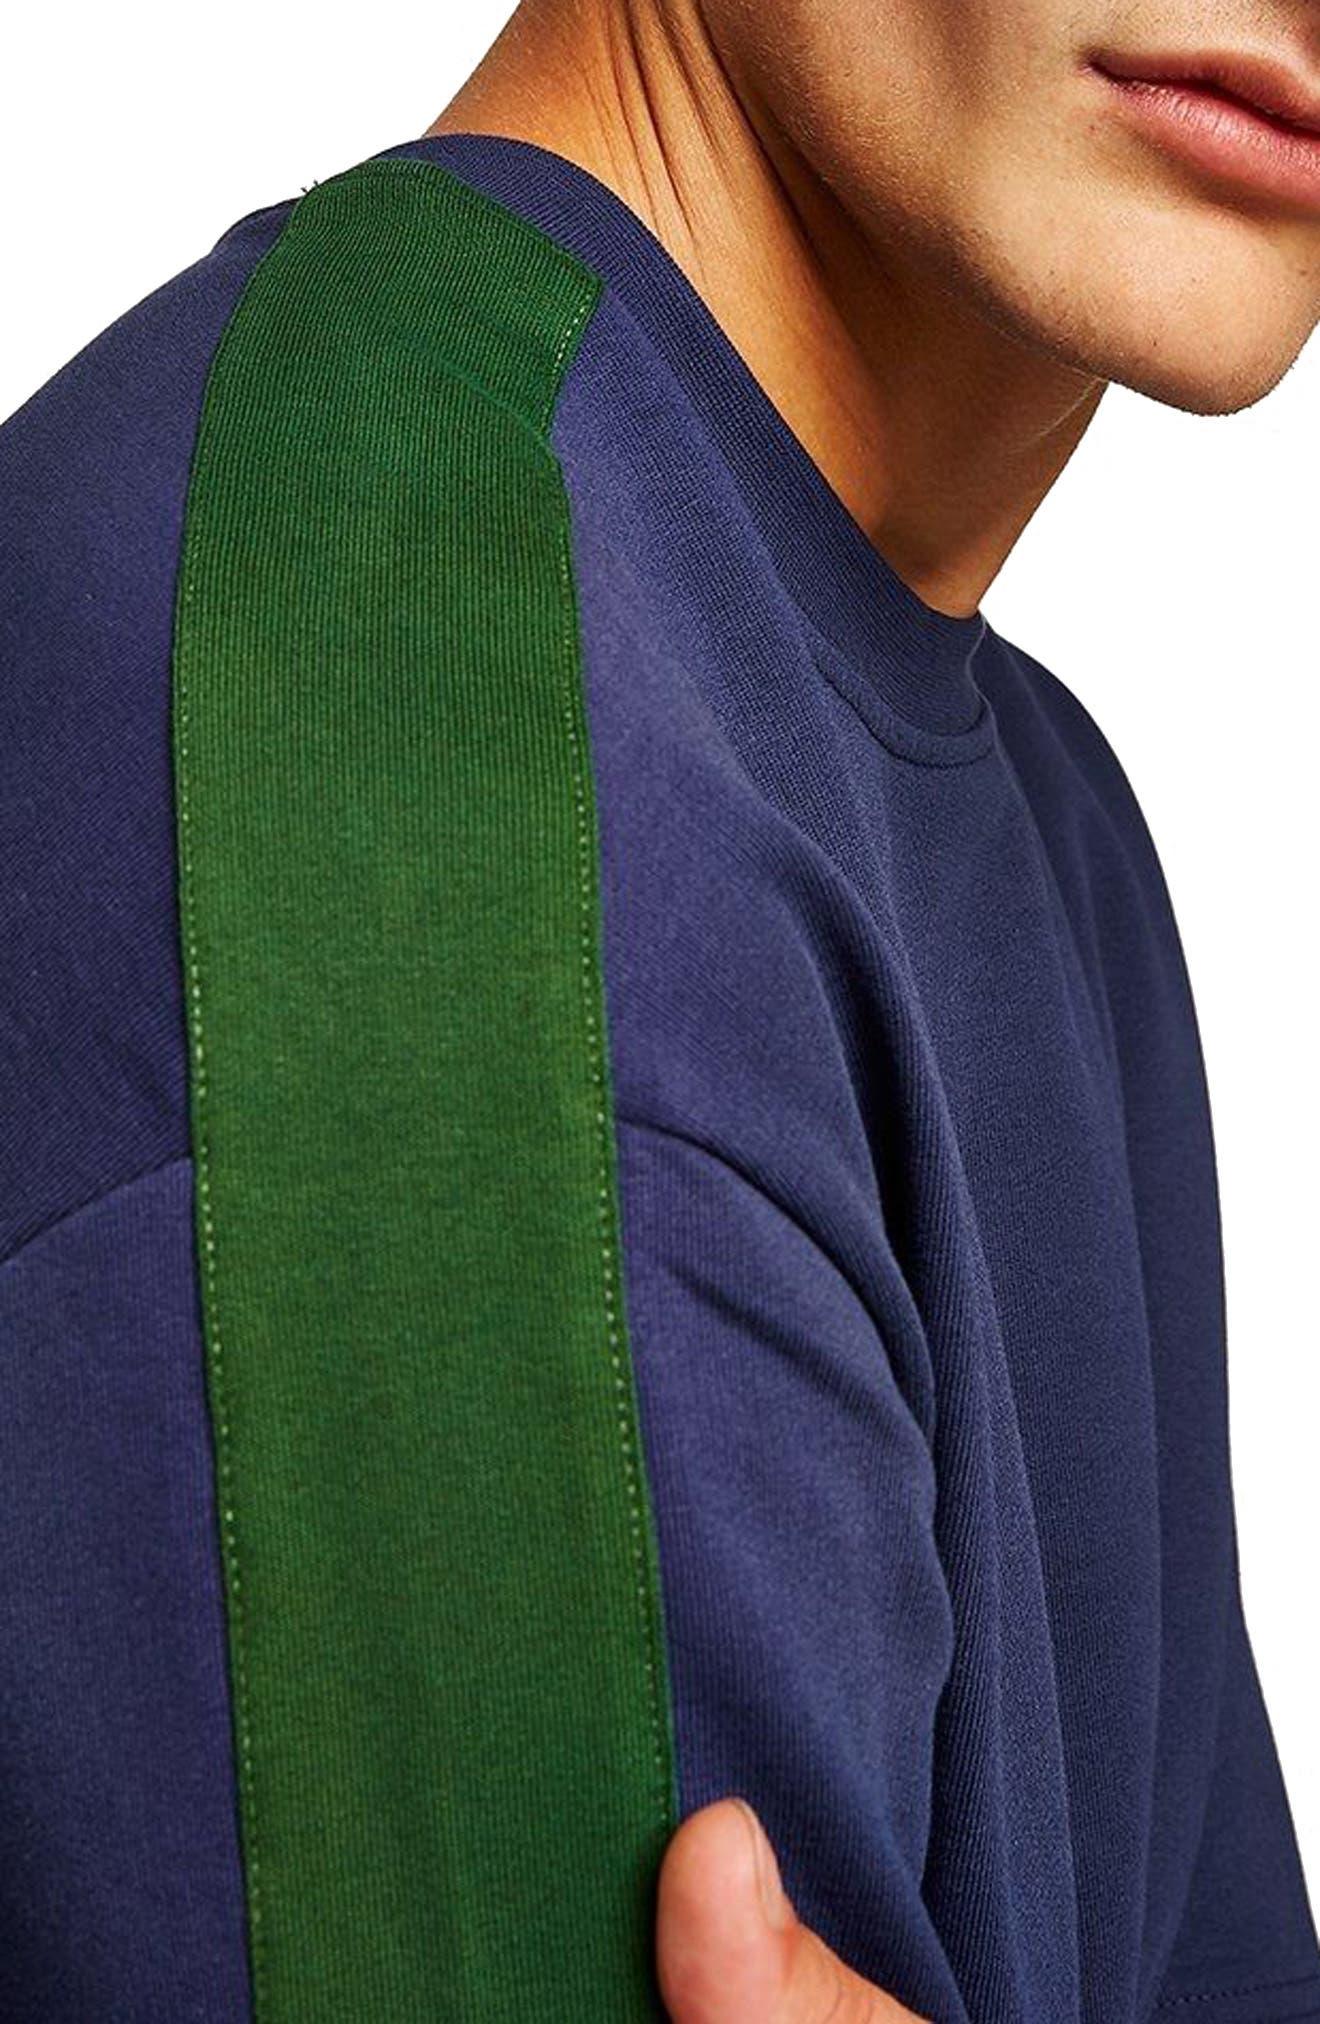 Colorblock Short Sleeve Sweatshirt,                             Alternate thumbnail 3, color,                             Navy Blue Multi